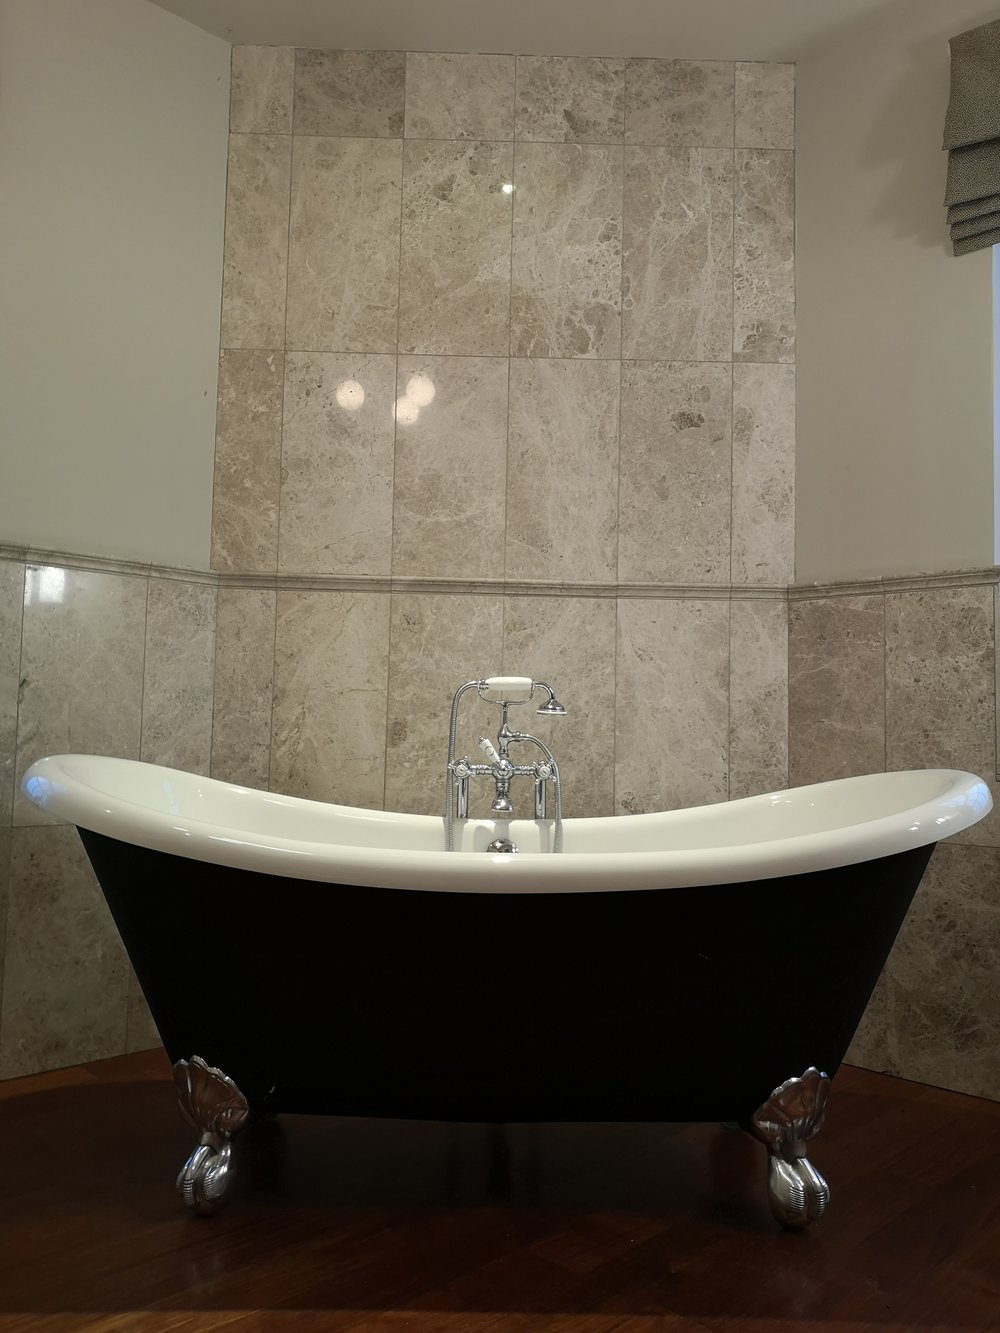 Trent bathroom